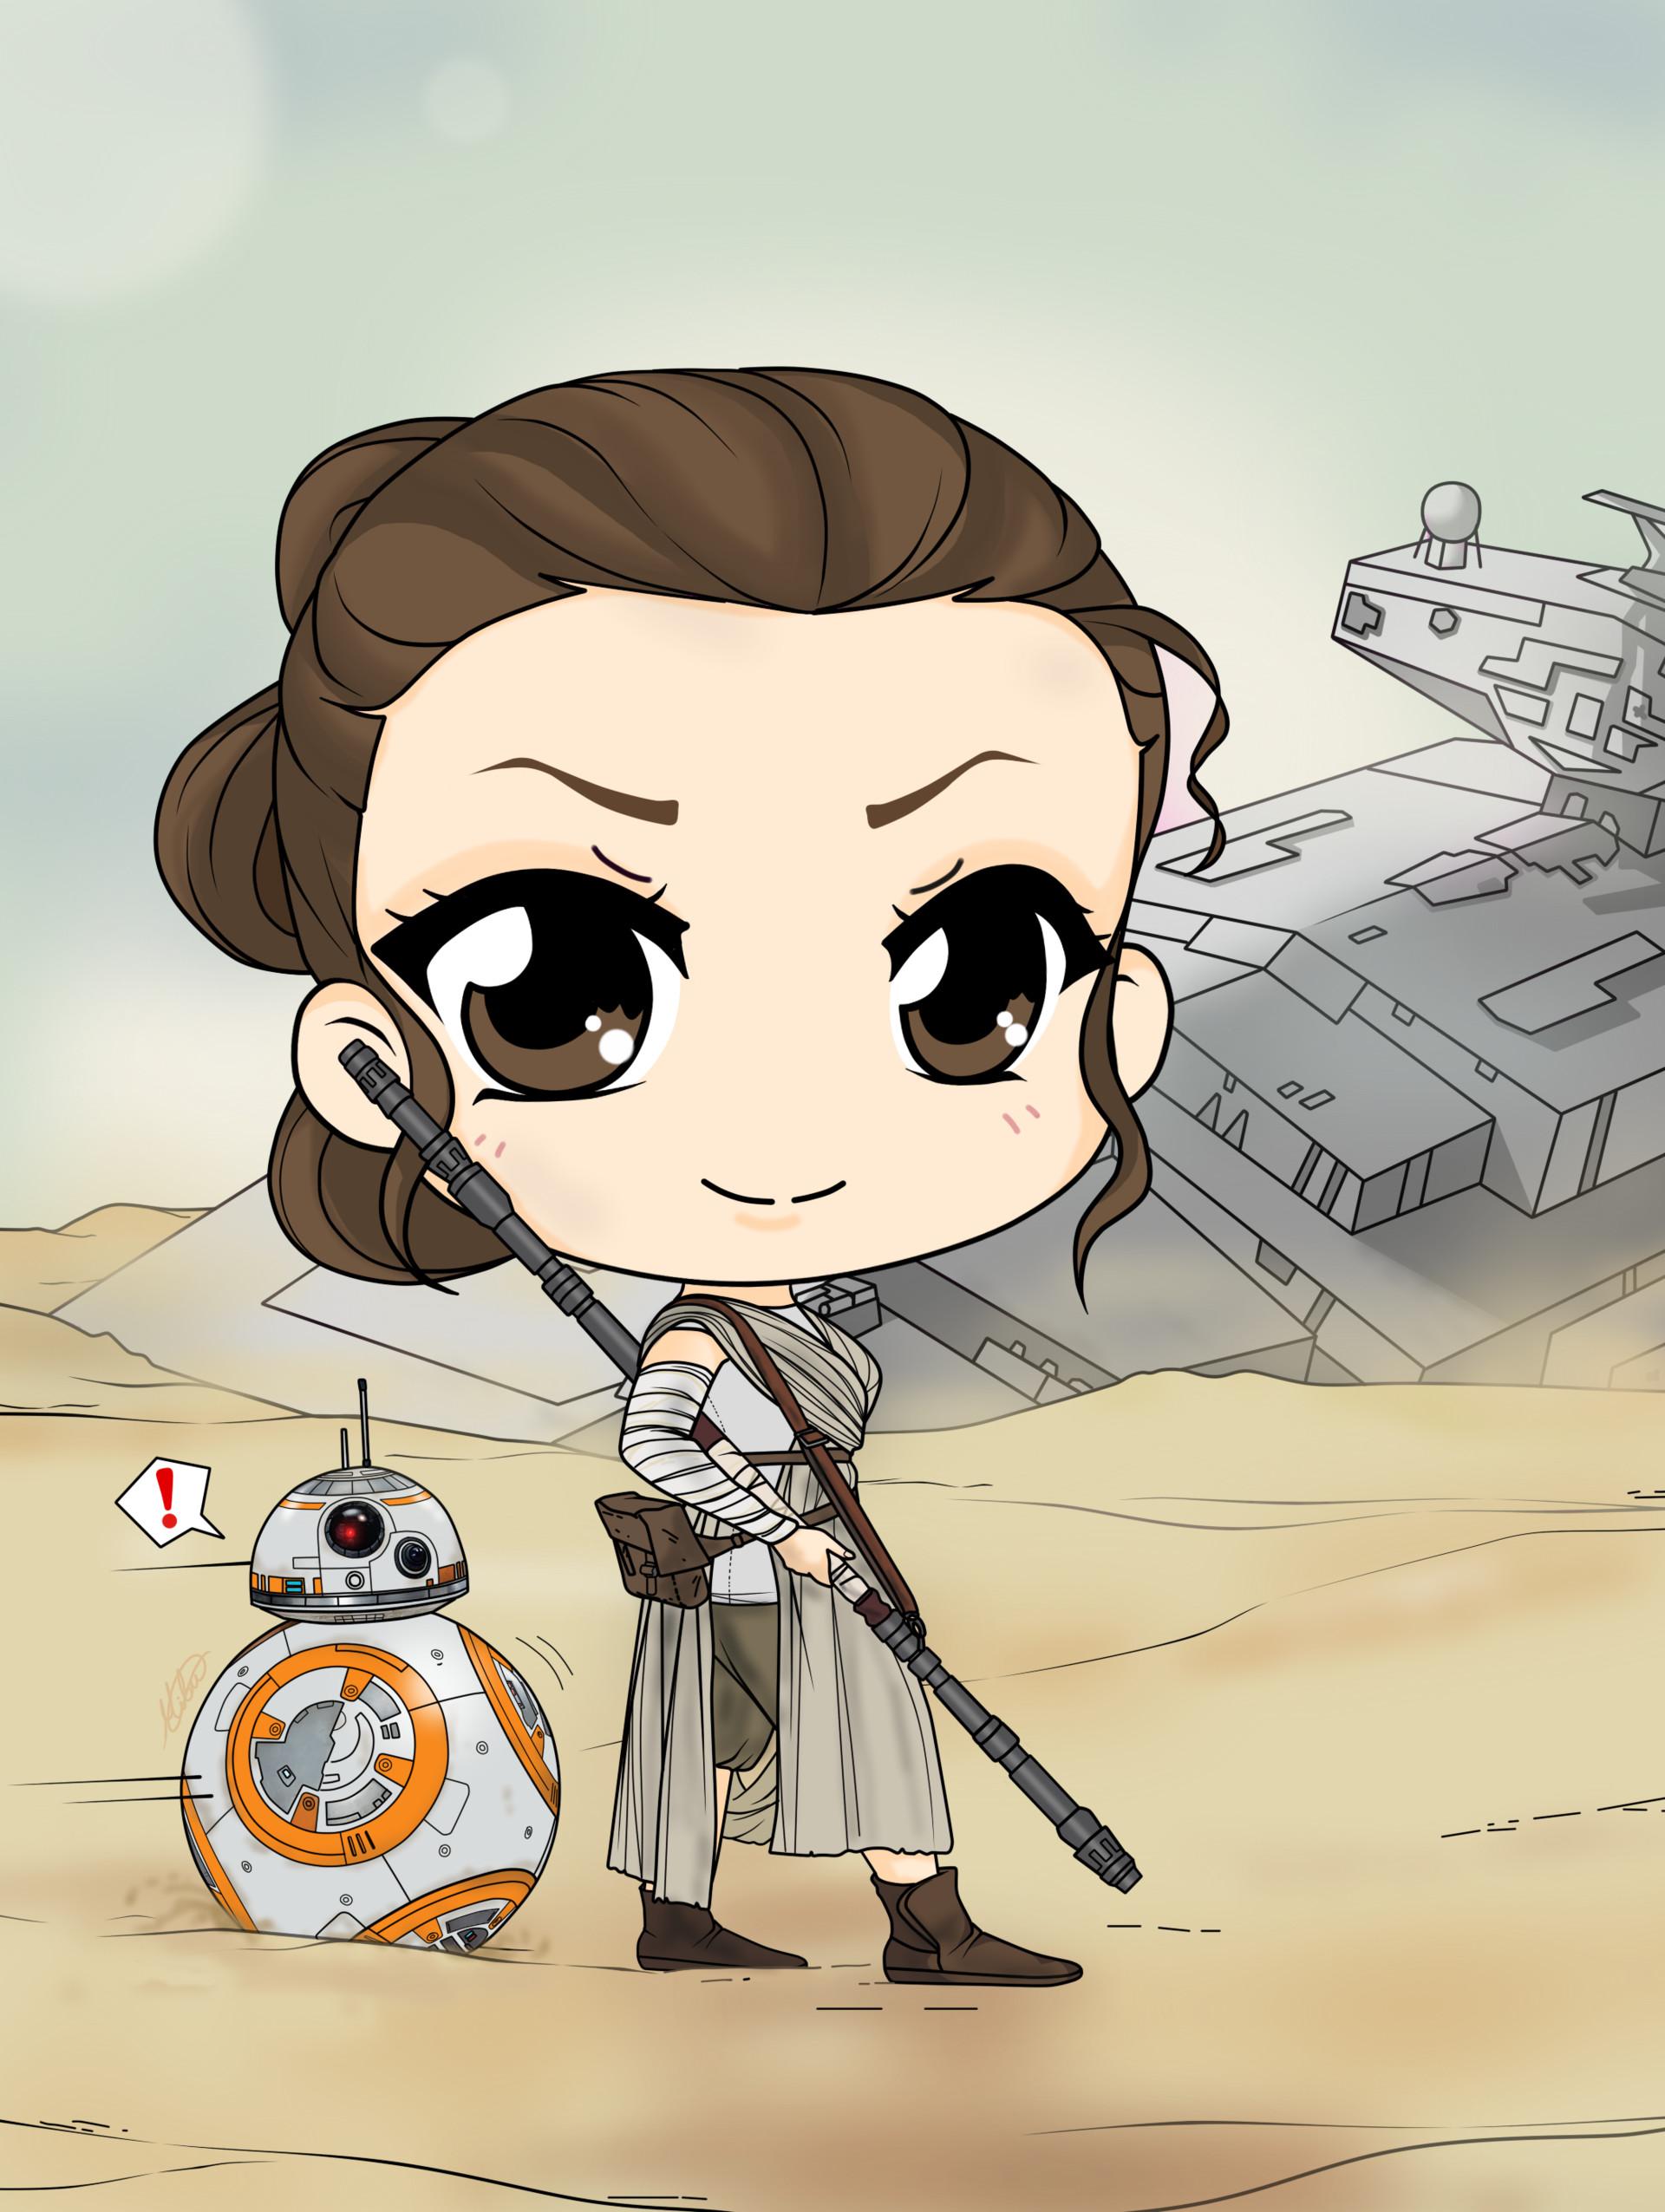 Artstation - Star Wars, The Force Awakens - Rey  Bb 8 -9185